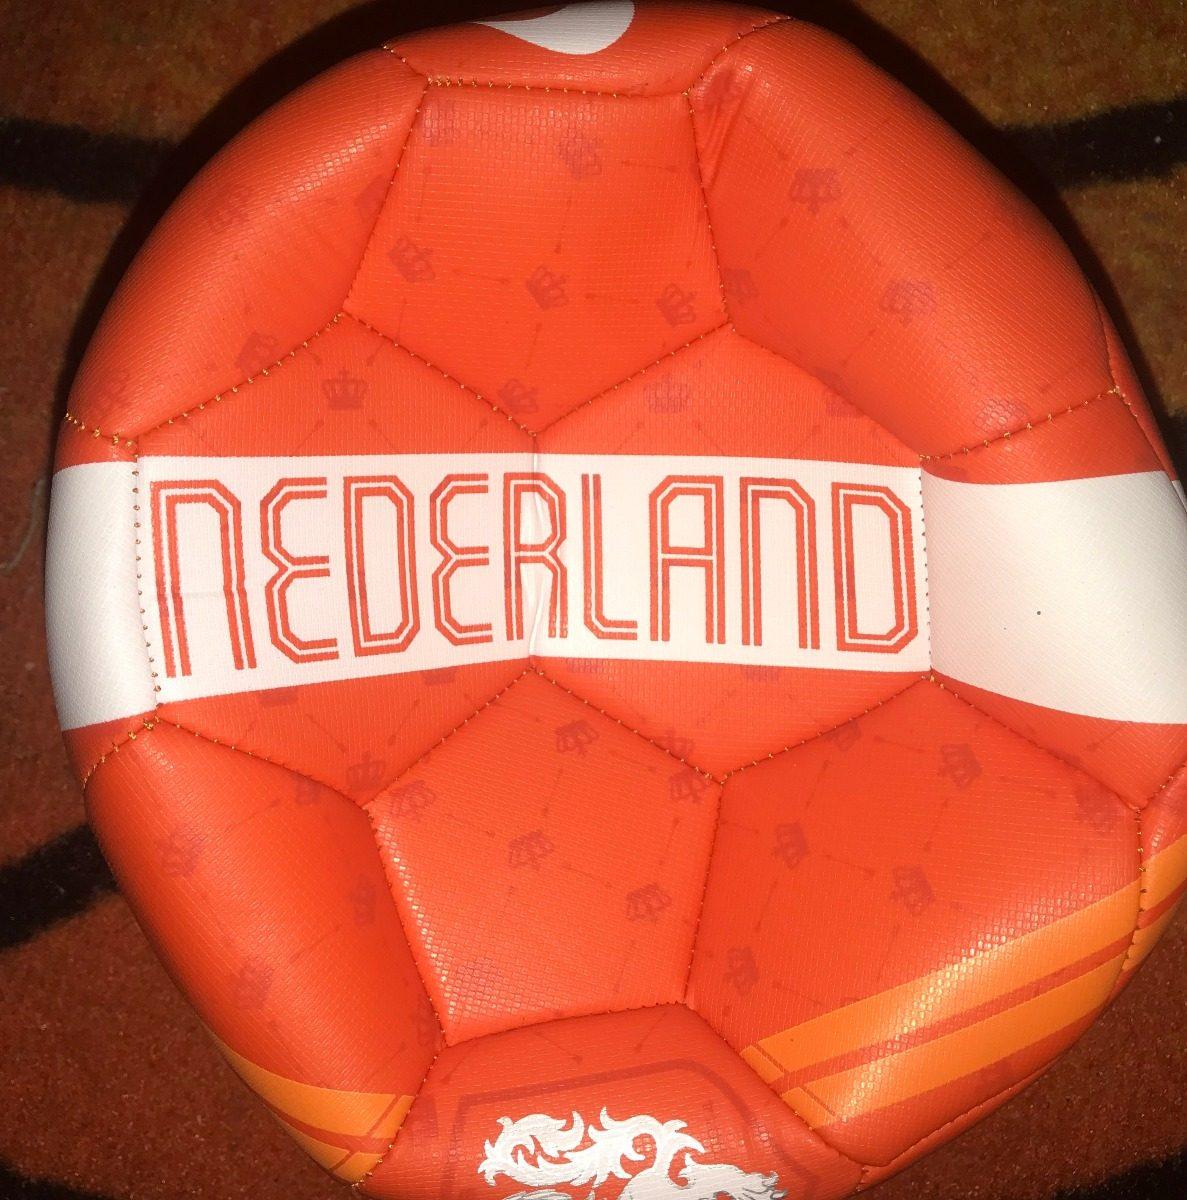 fa723002bc0 Pelota Nike Nederland Original Nueva Naranja - $ 1.150,00 en Mercado ...